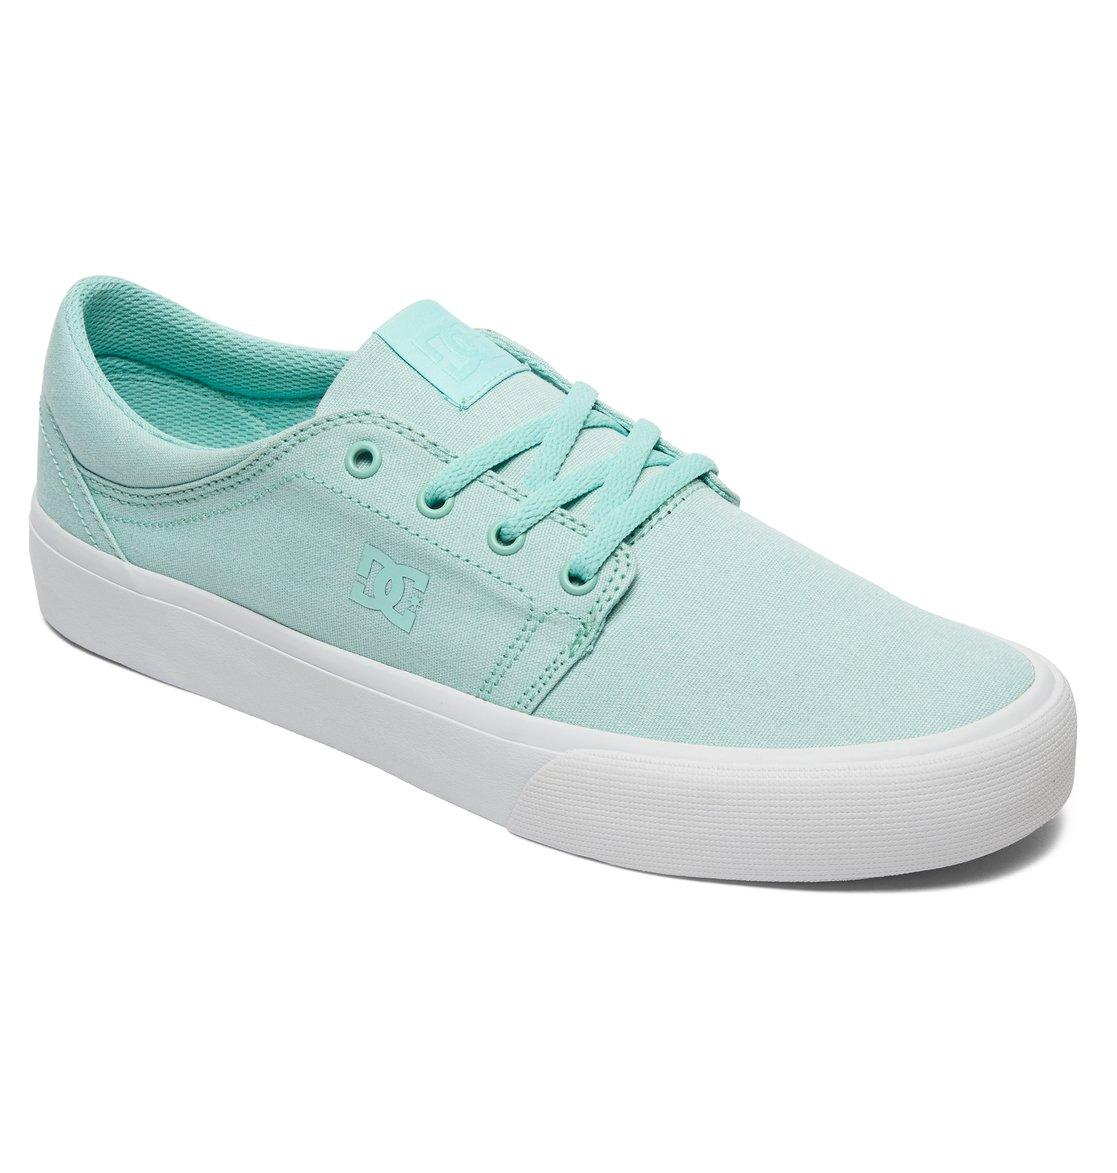 dfdcfd6de2489 1 Trase TX - Baskets pour Homme Vert ADYS300126 DC Shoes